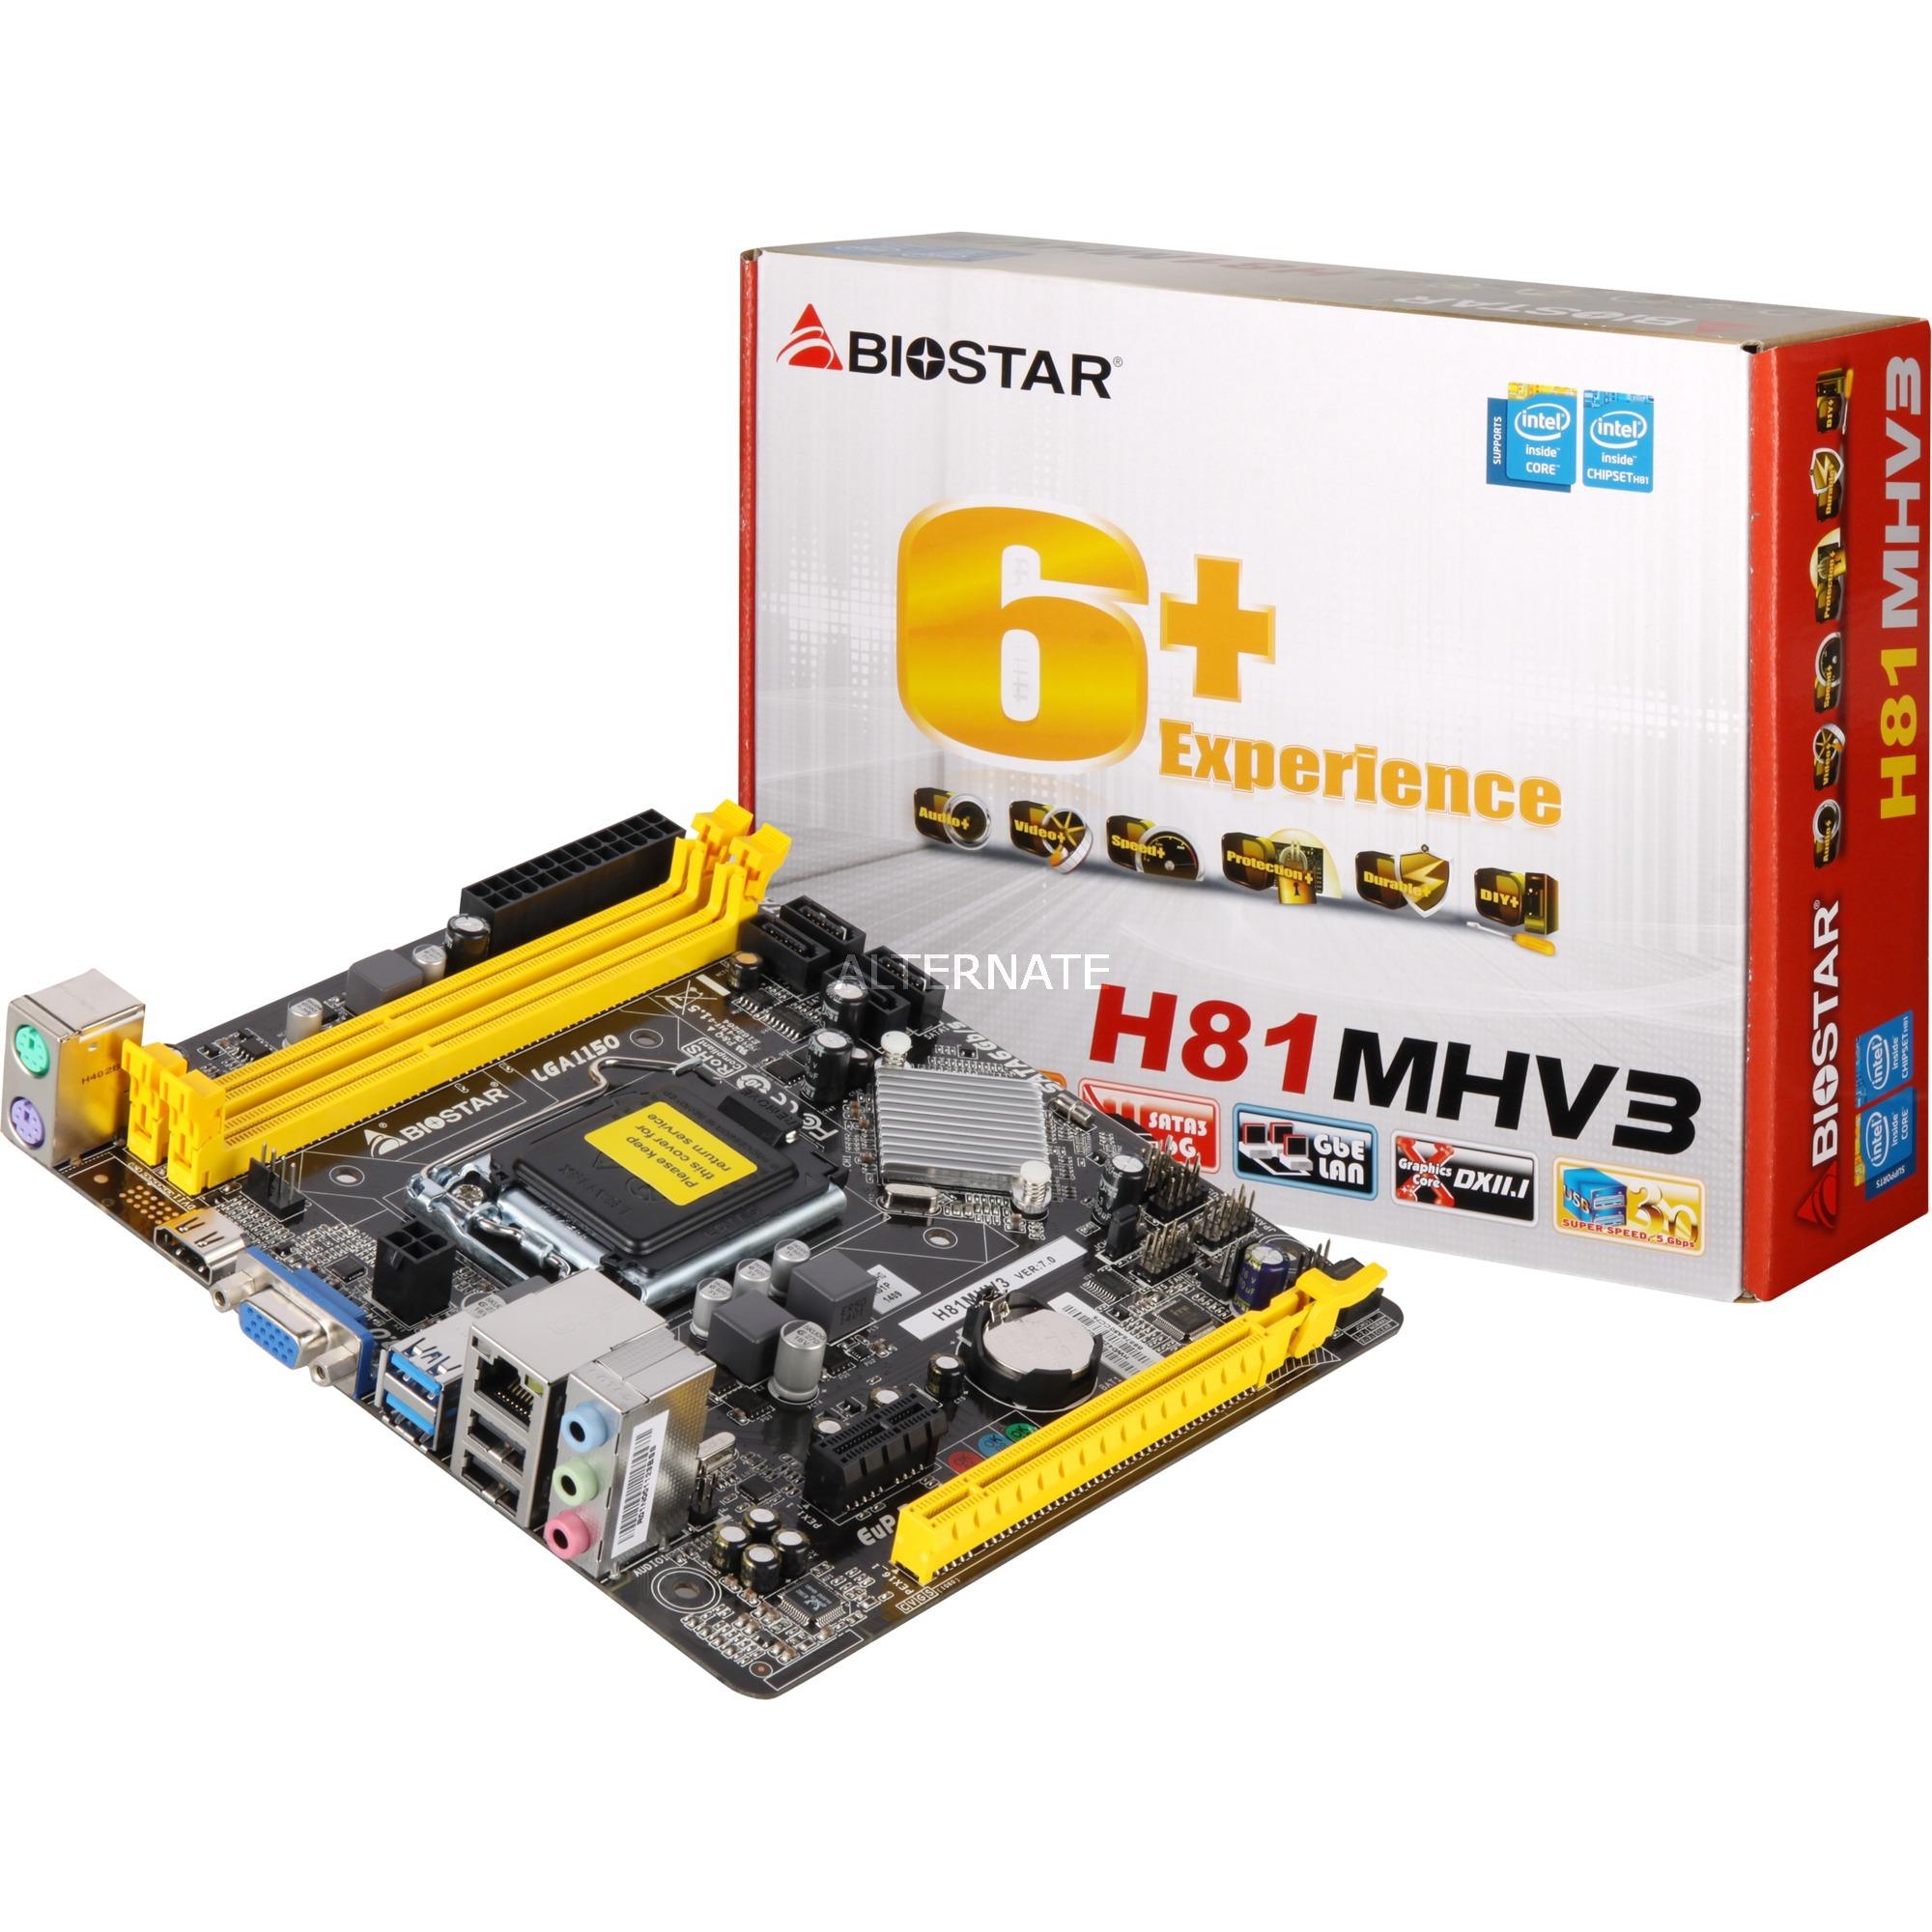 H81MHV3 Intel H81 LGA 1150 (Zócalo H3) Micro ATX placa base